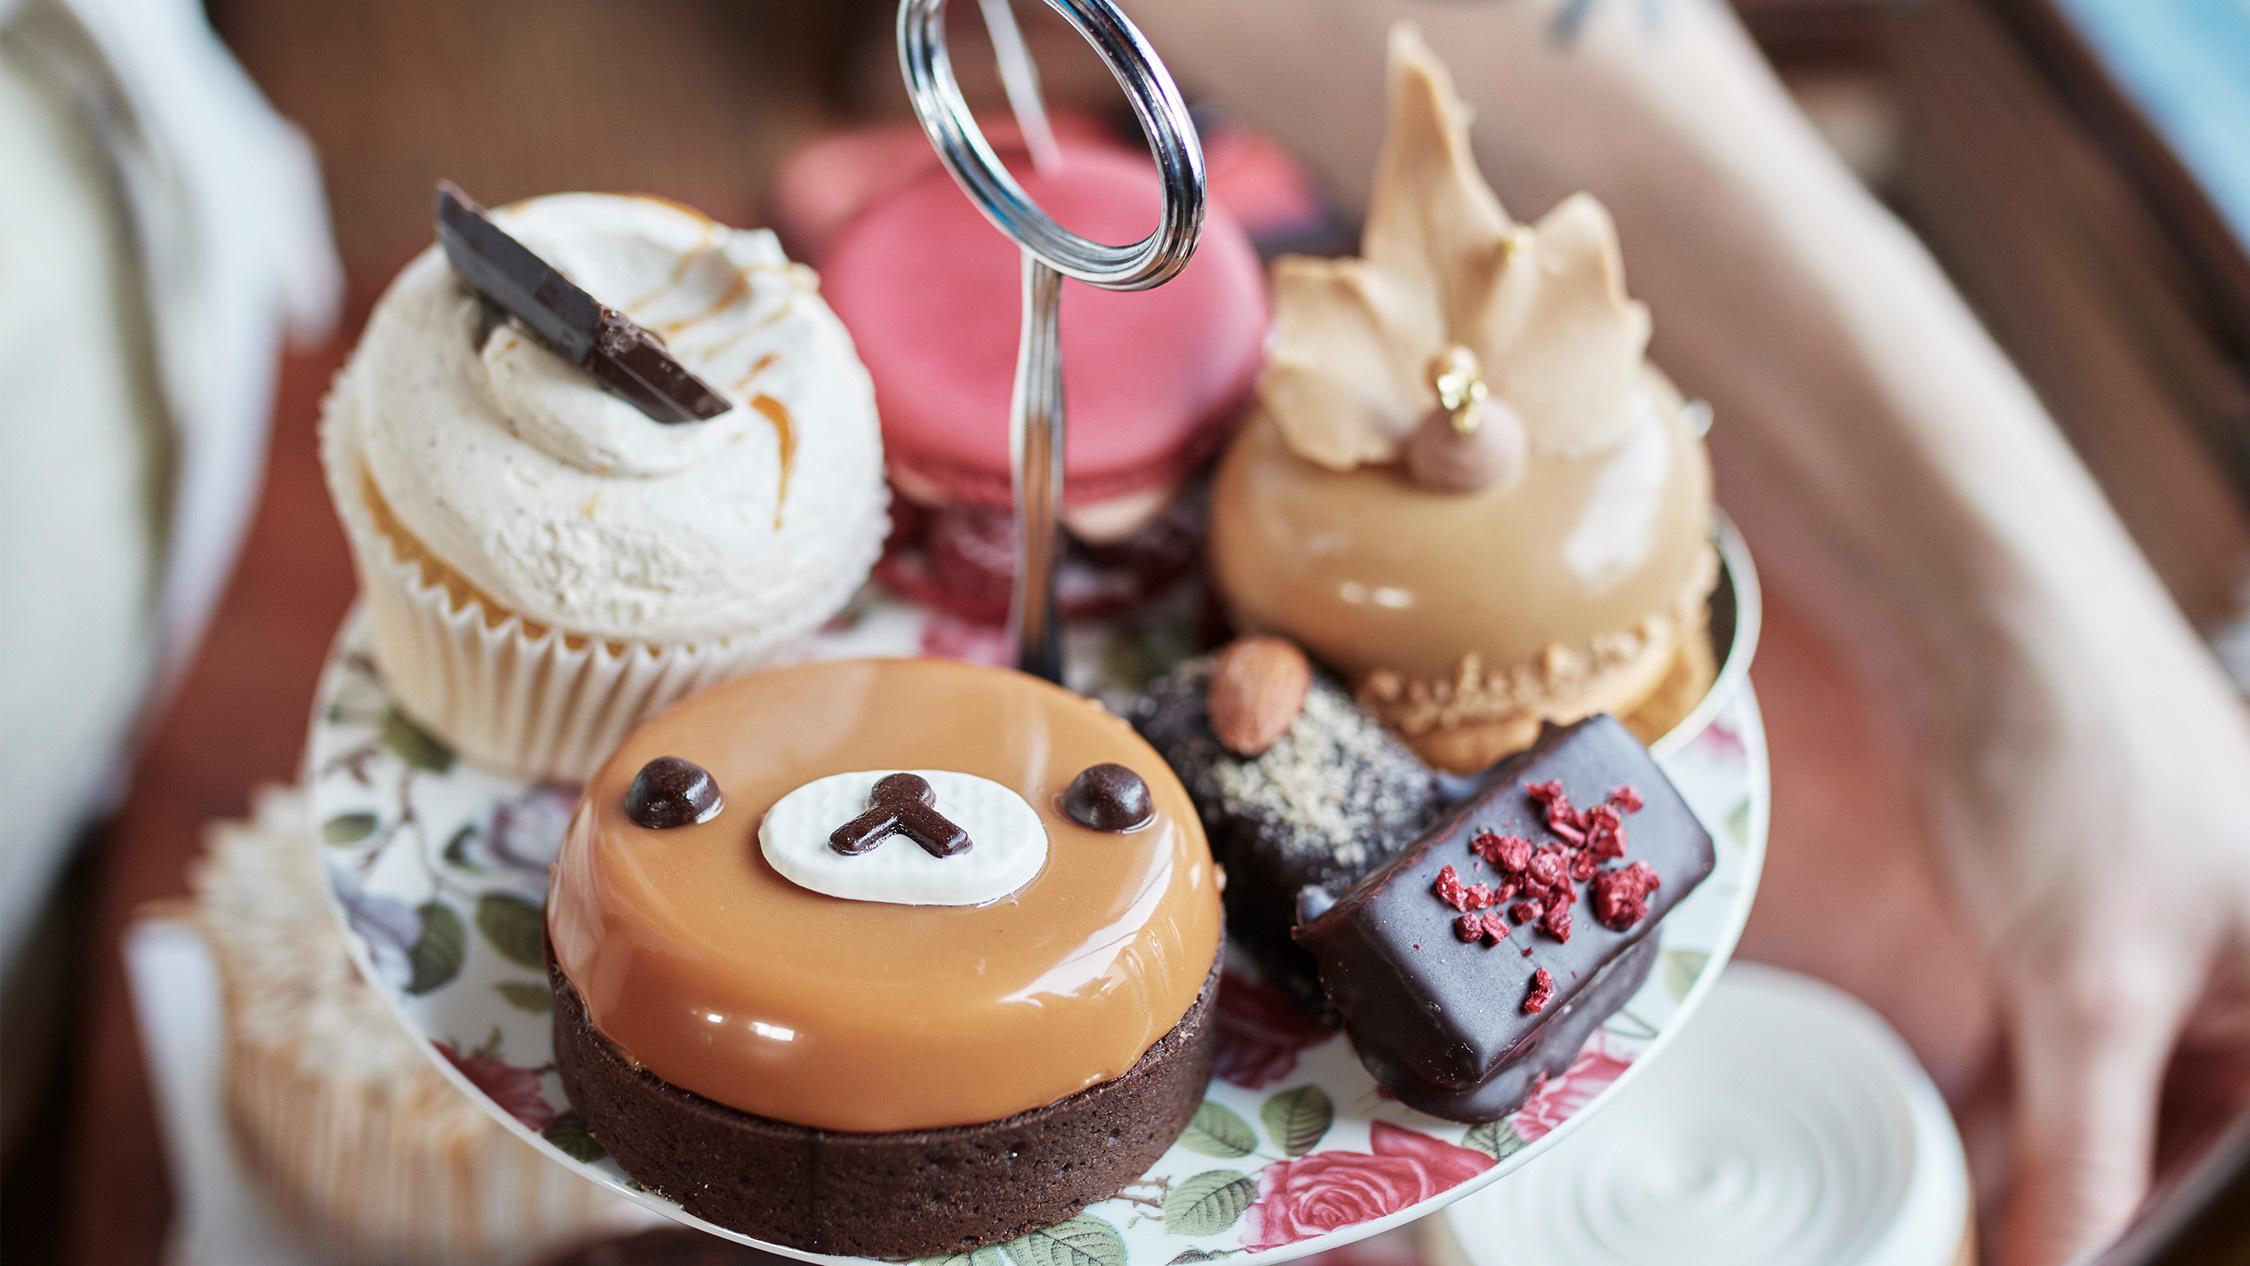 Cakes at Sweet Set High Tea